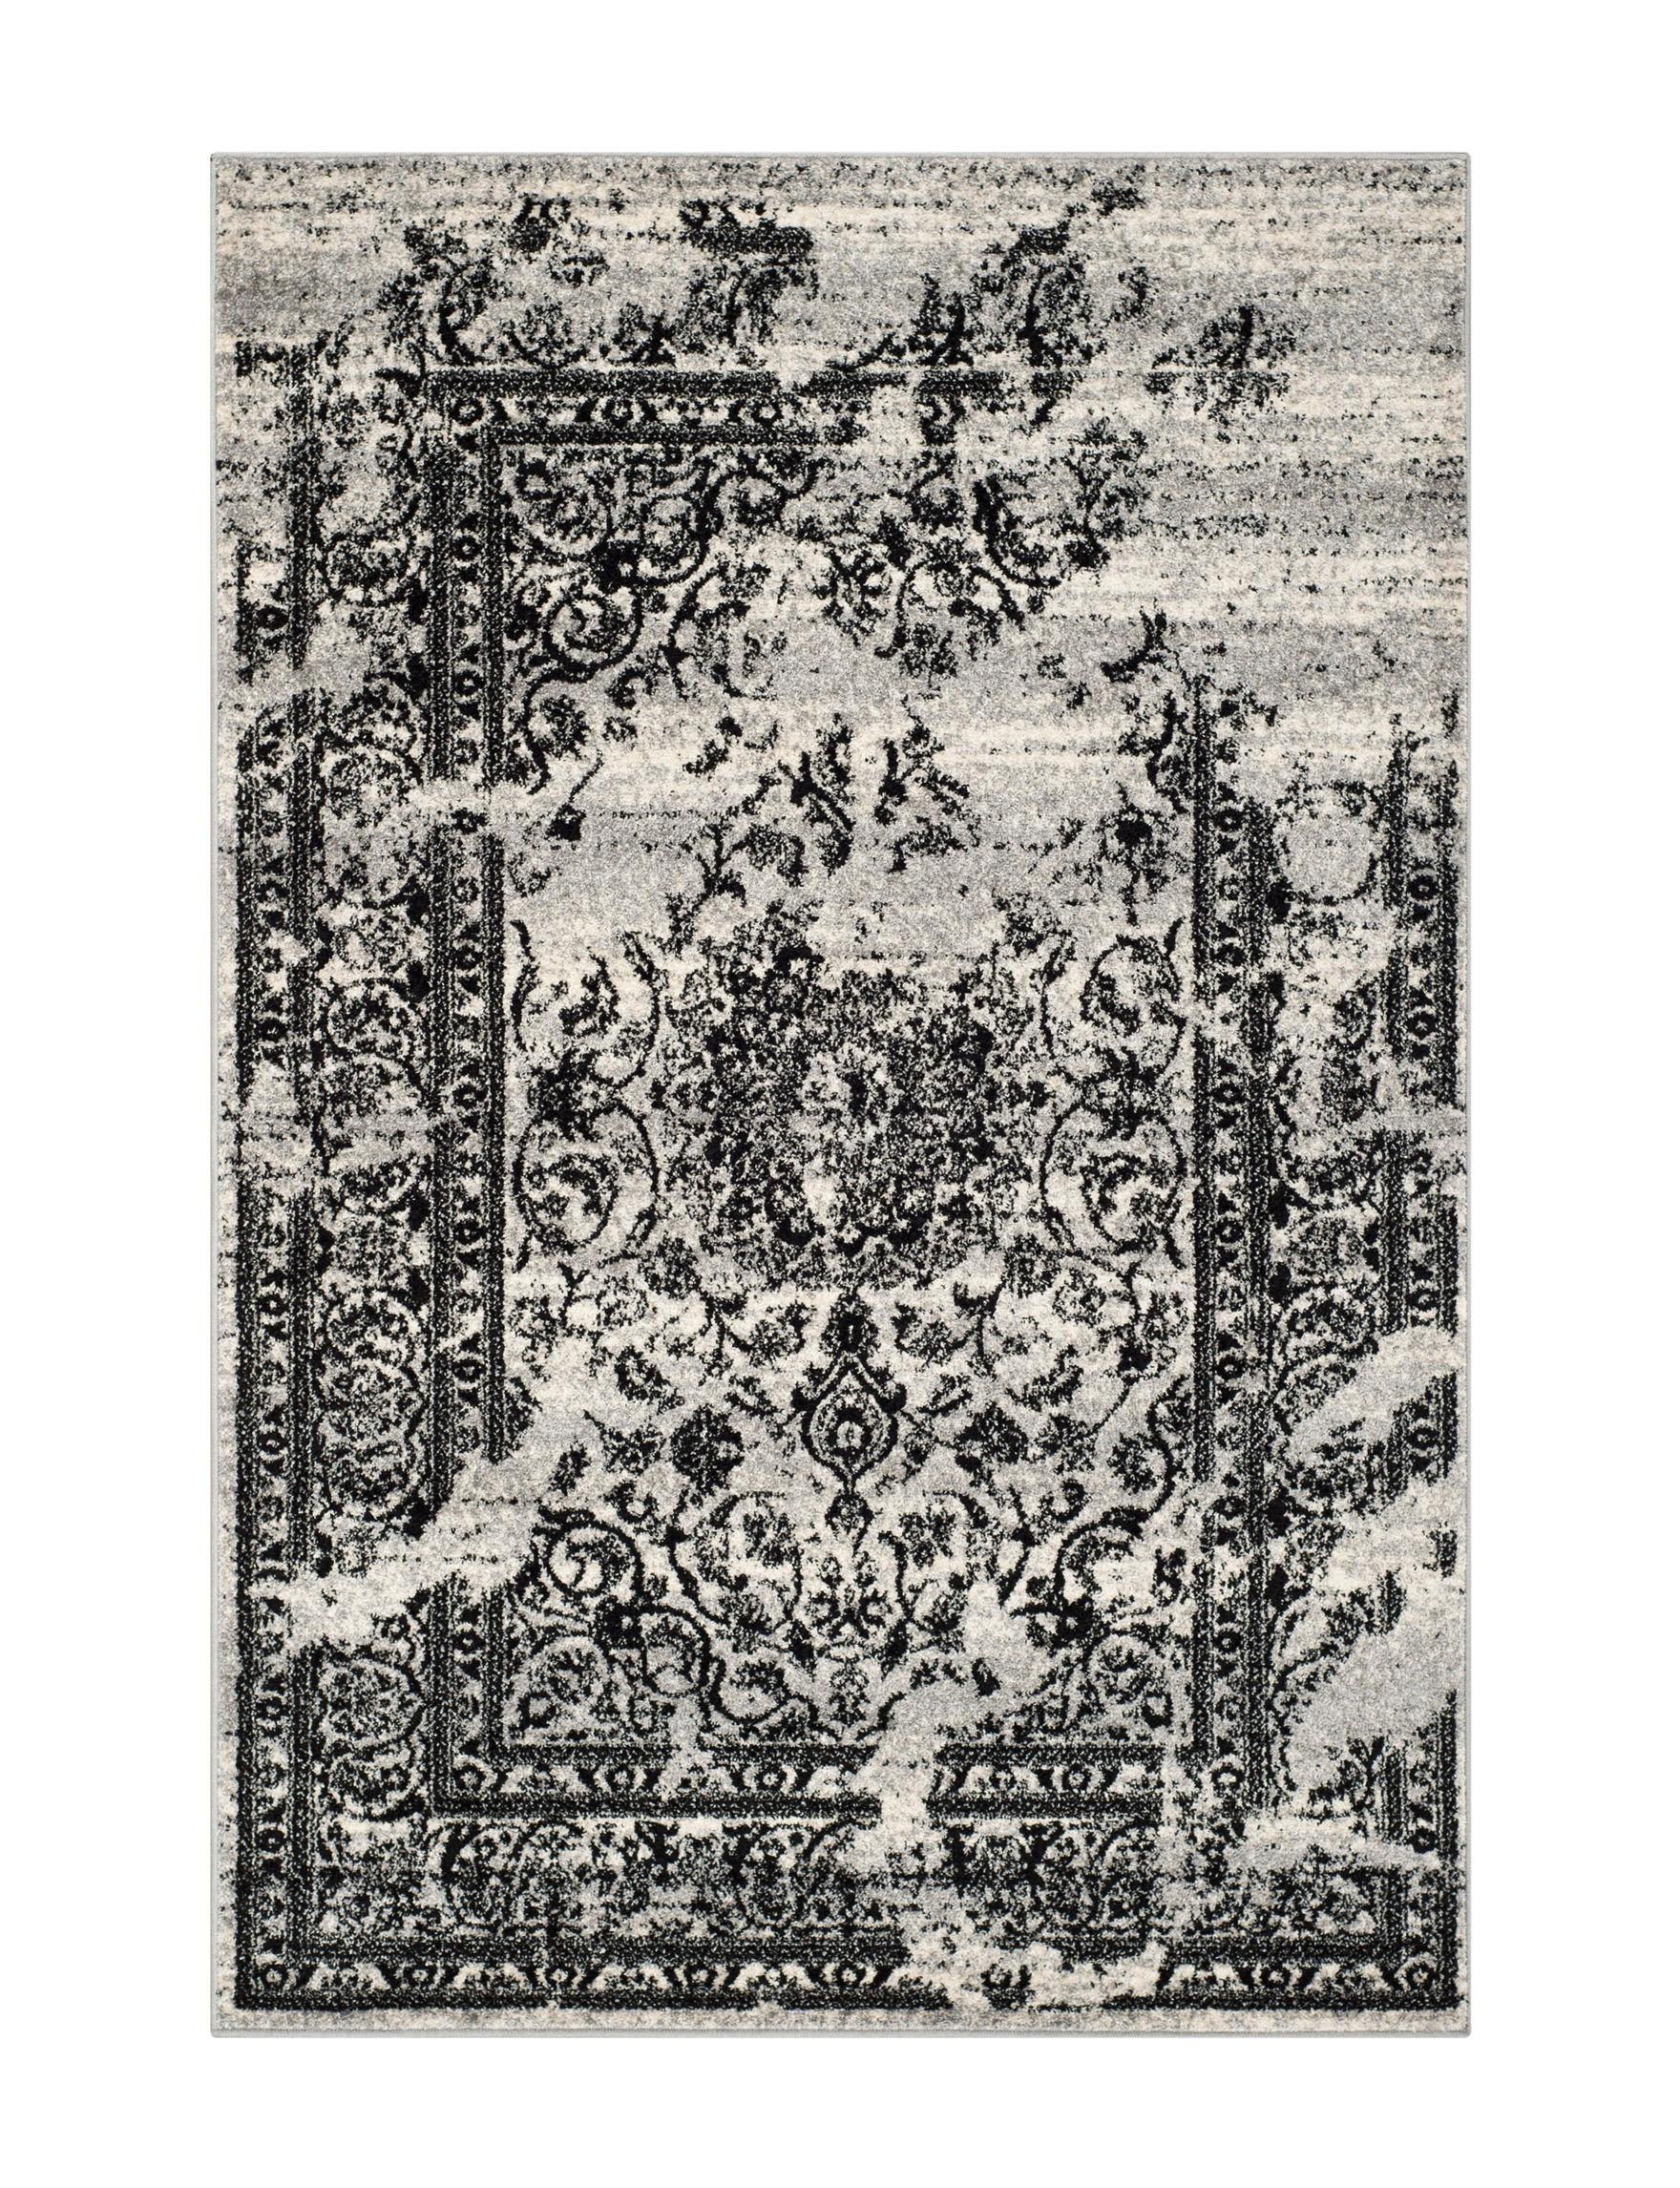 Safavieh Silver / Black Area Rugs